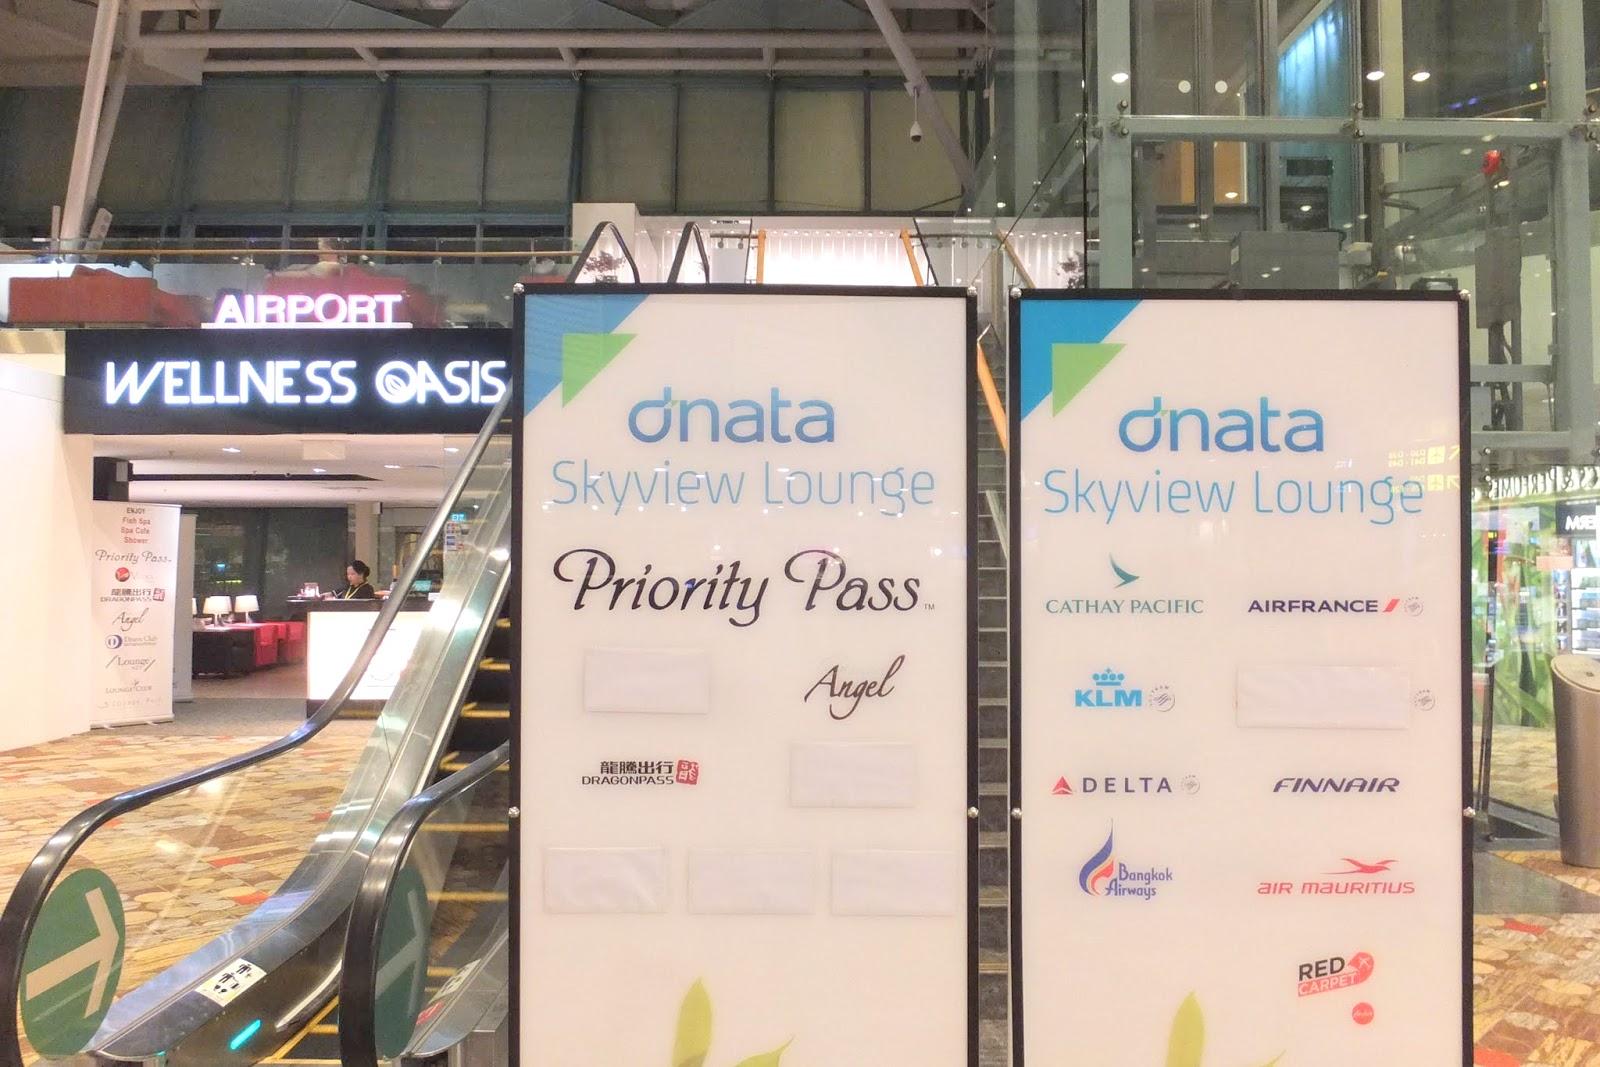 changi-airport-dnata-skyviewlounge-terminal1